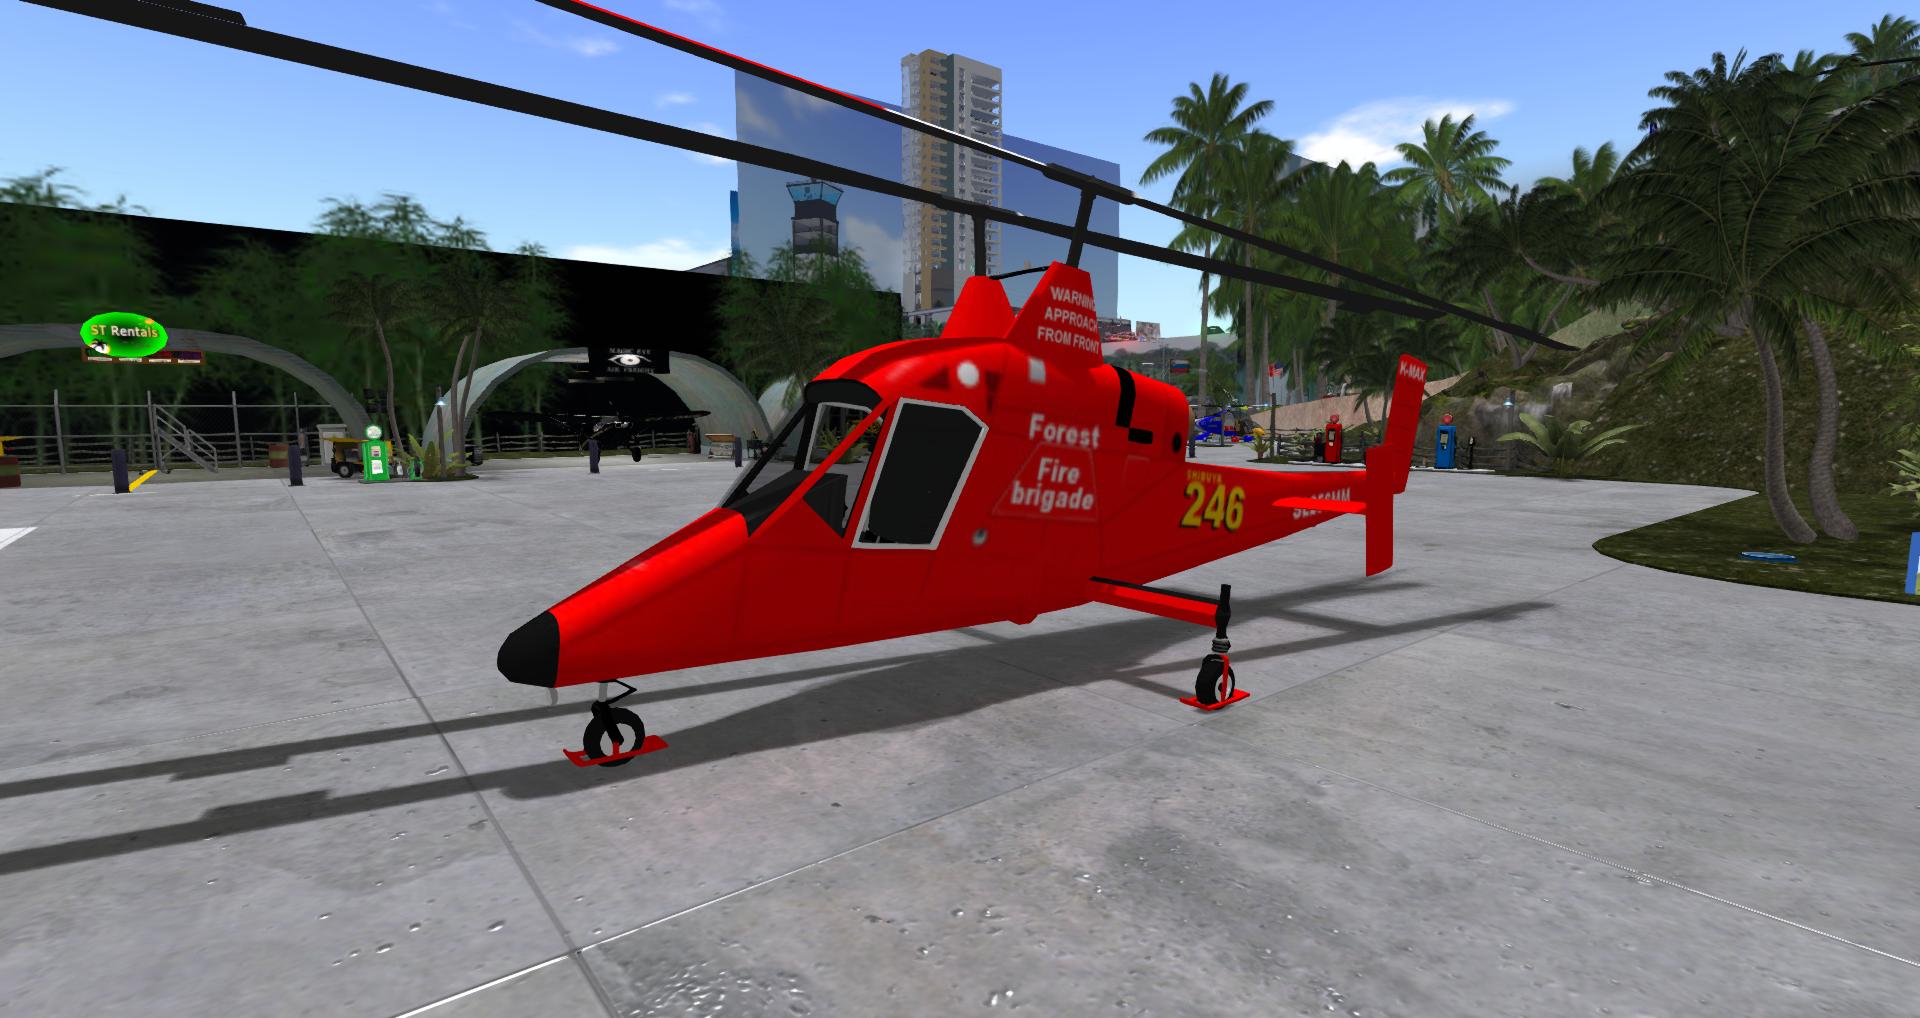 Kaman K MAX MM   Second Life Aviation Wiki   FANDOM powered by Wikia